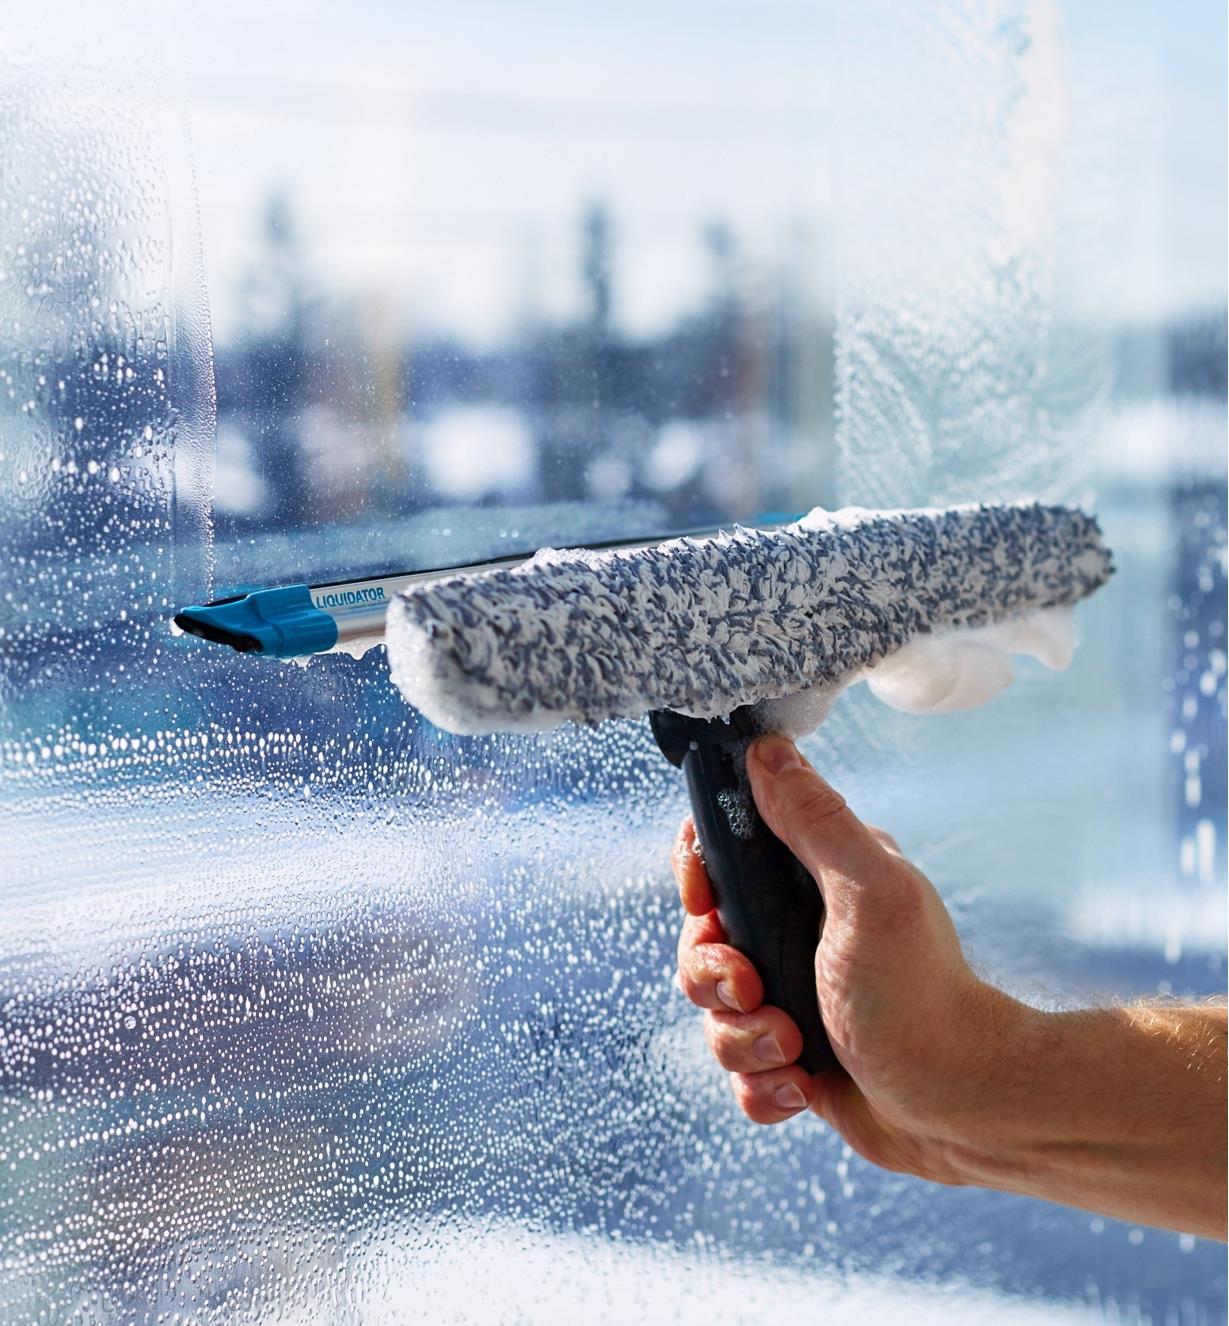 SA091 - Repl. Squeegee Blade for Moerman Window-Washing Tool